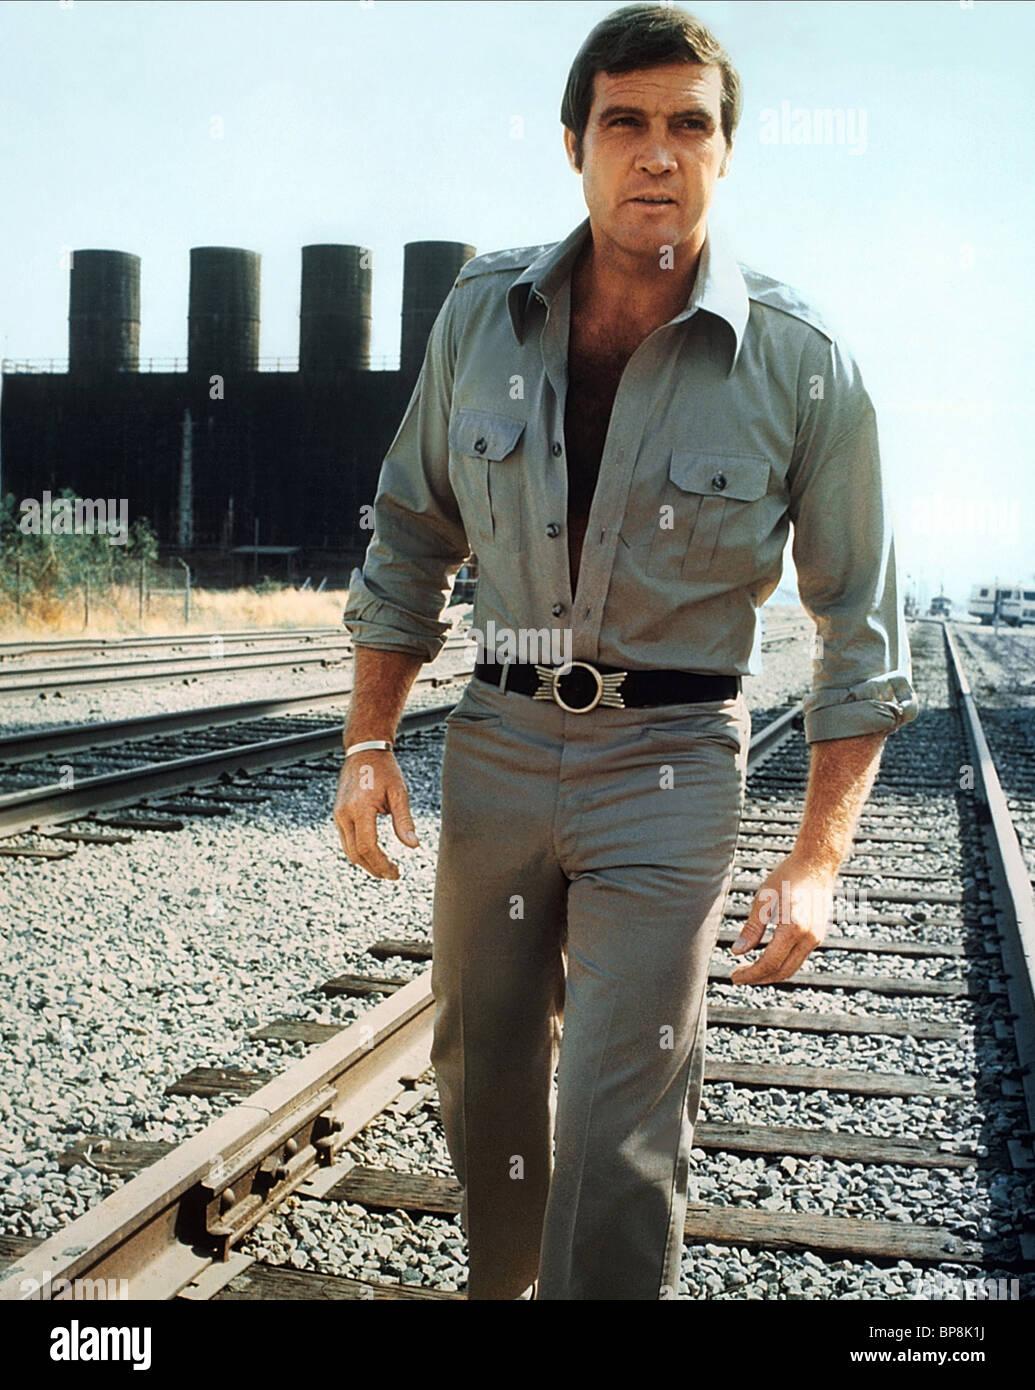 Lee Majors The Six Million Dollar Man 1974